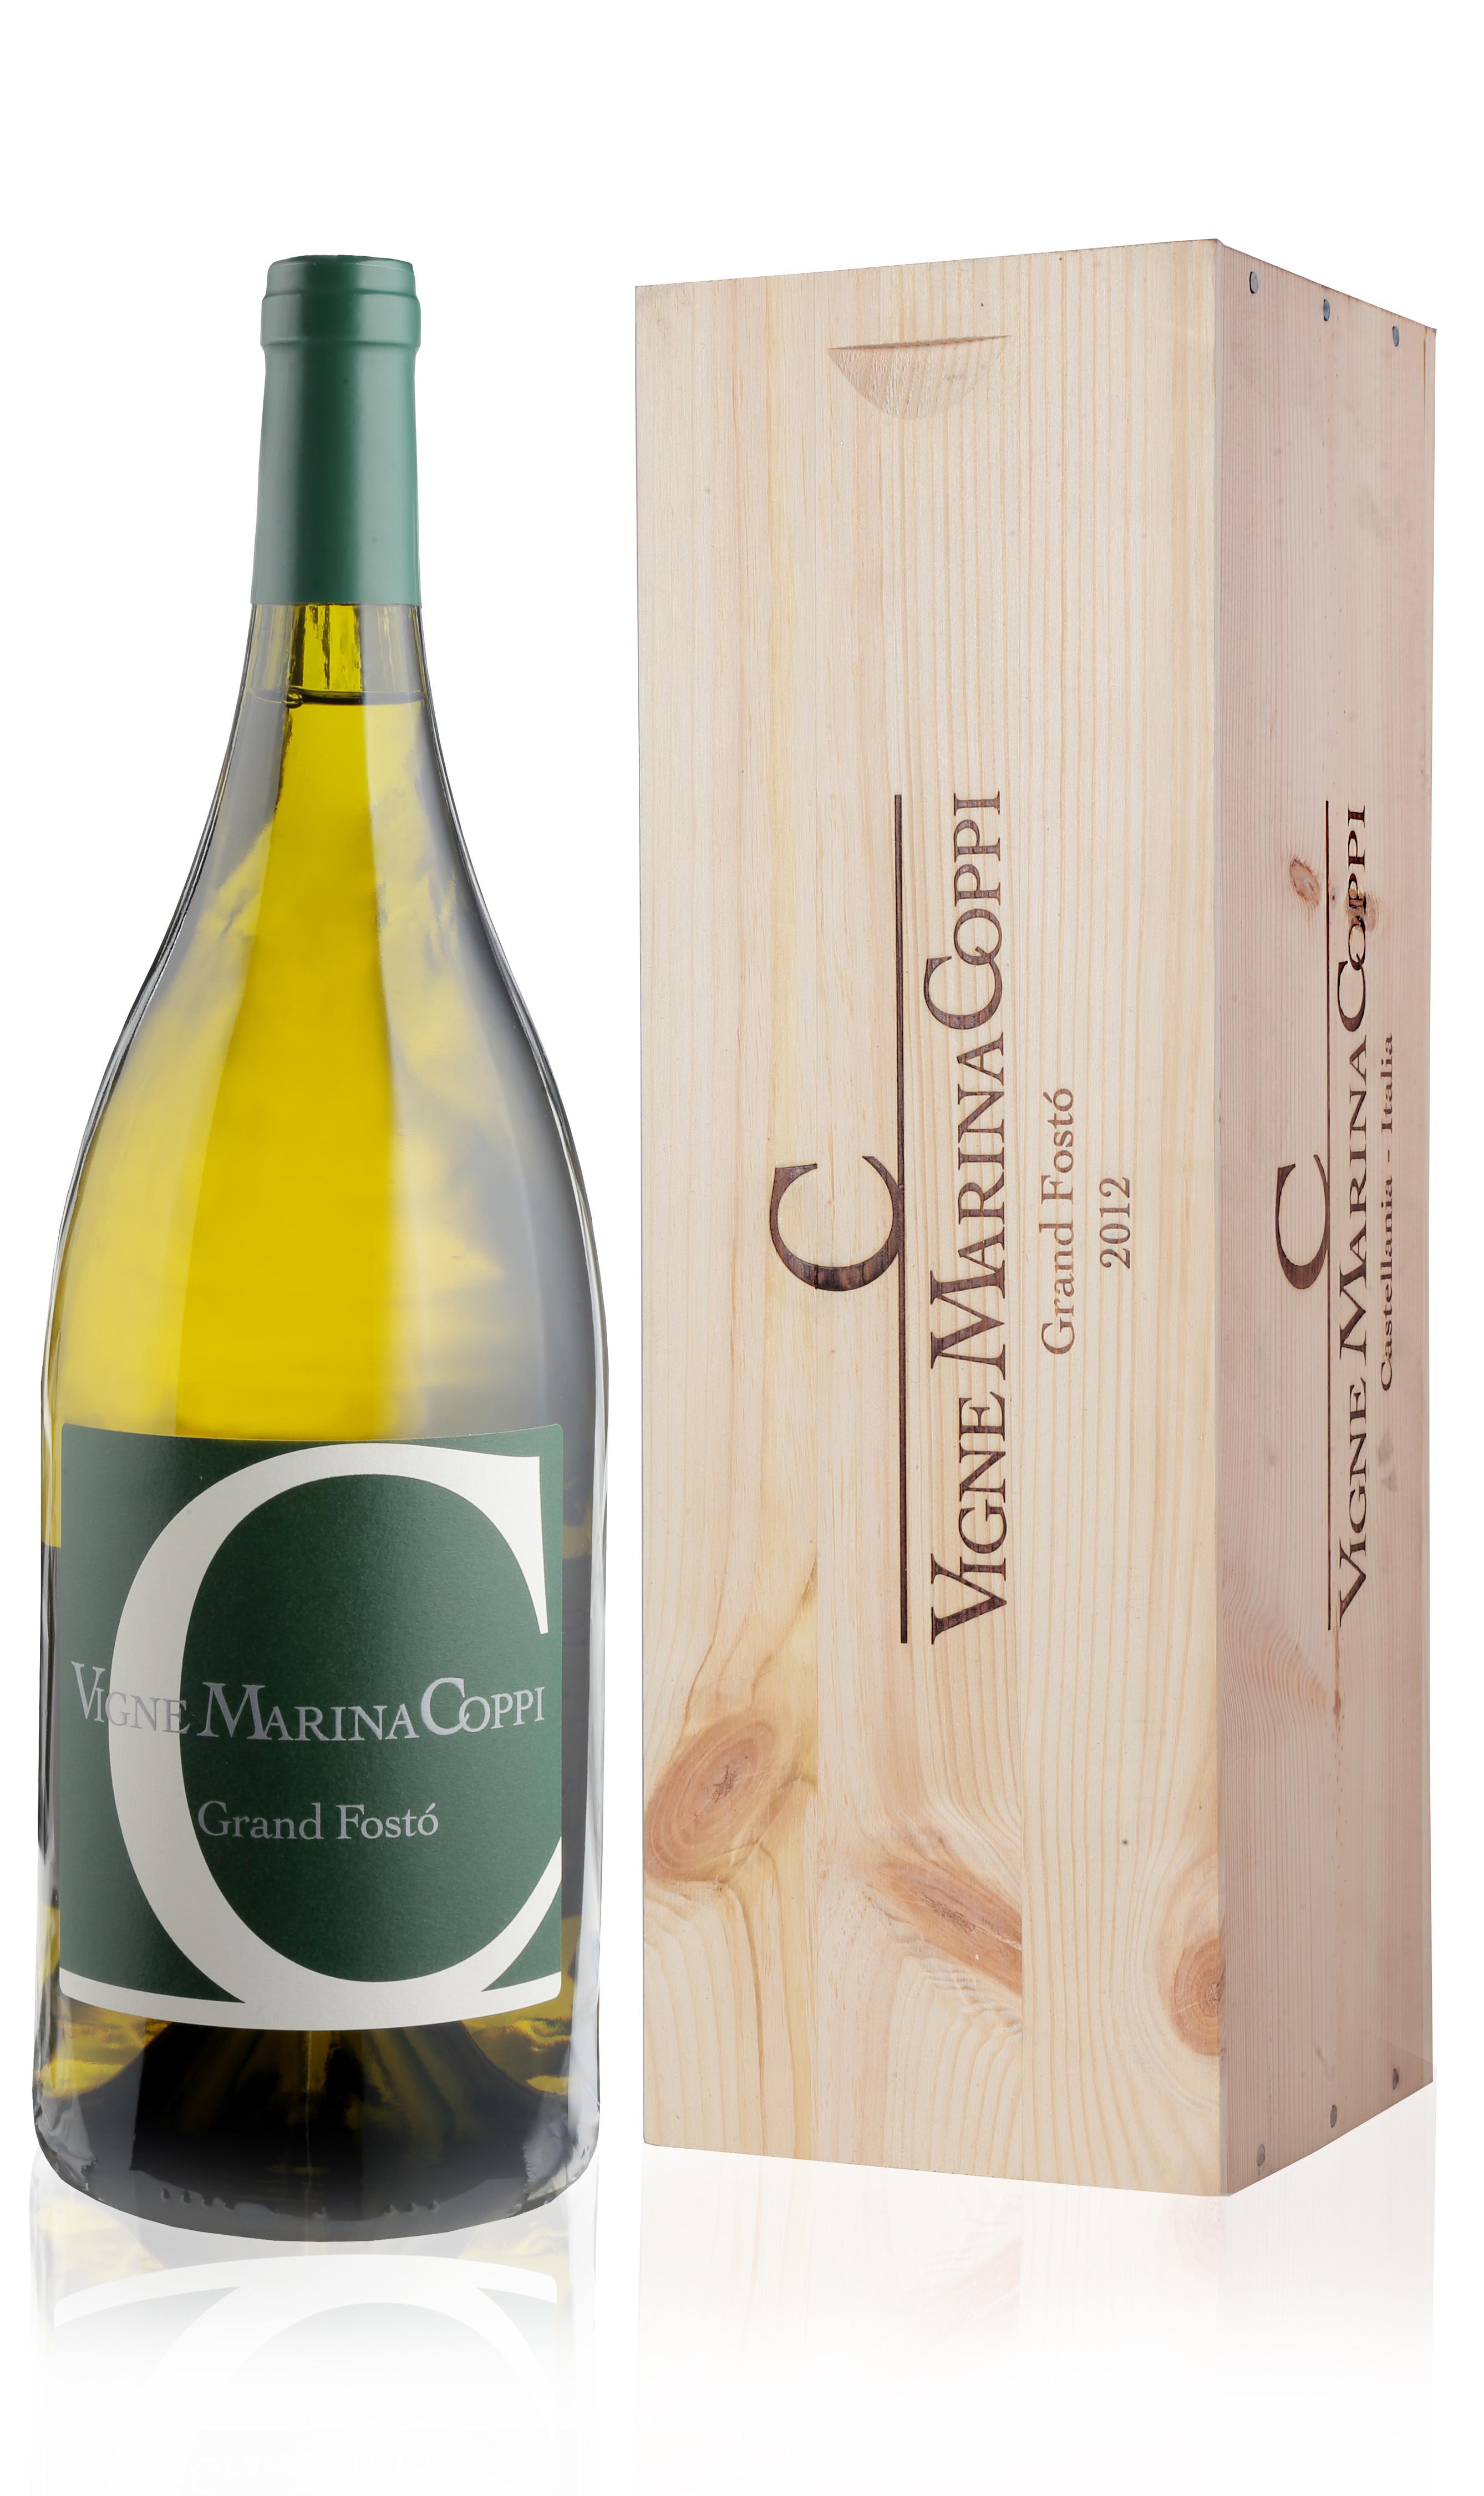 Vigne Marina Coppi, 'Grand Fosto' Timorasso (Wooden Bottle Box) 2012